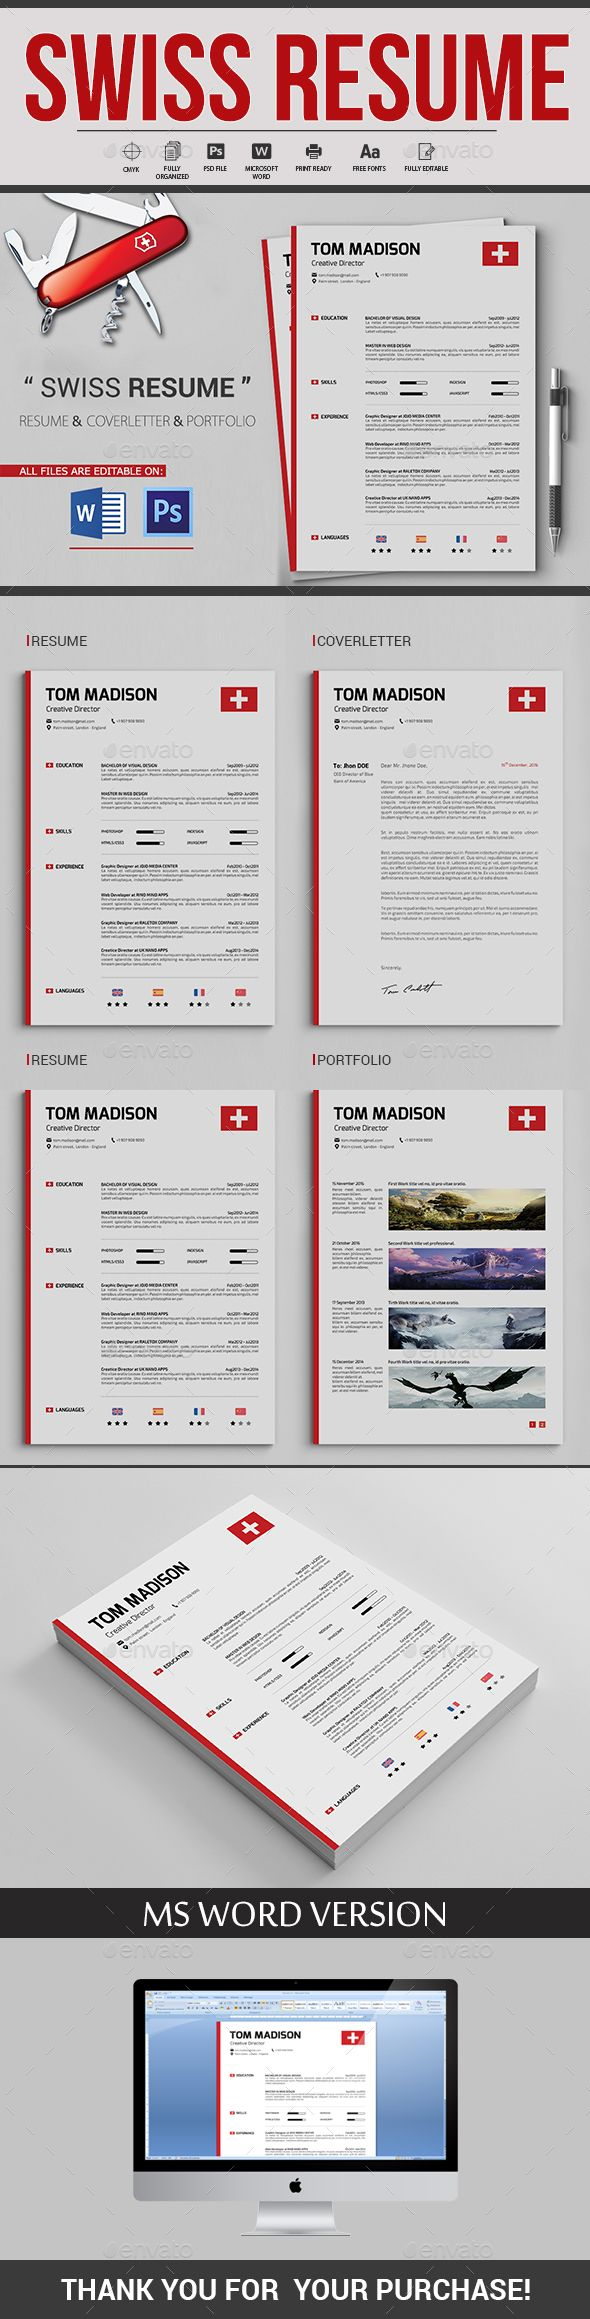 Swiss resume resume cv template and cv template swiss resume yelopaper Gallery